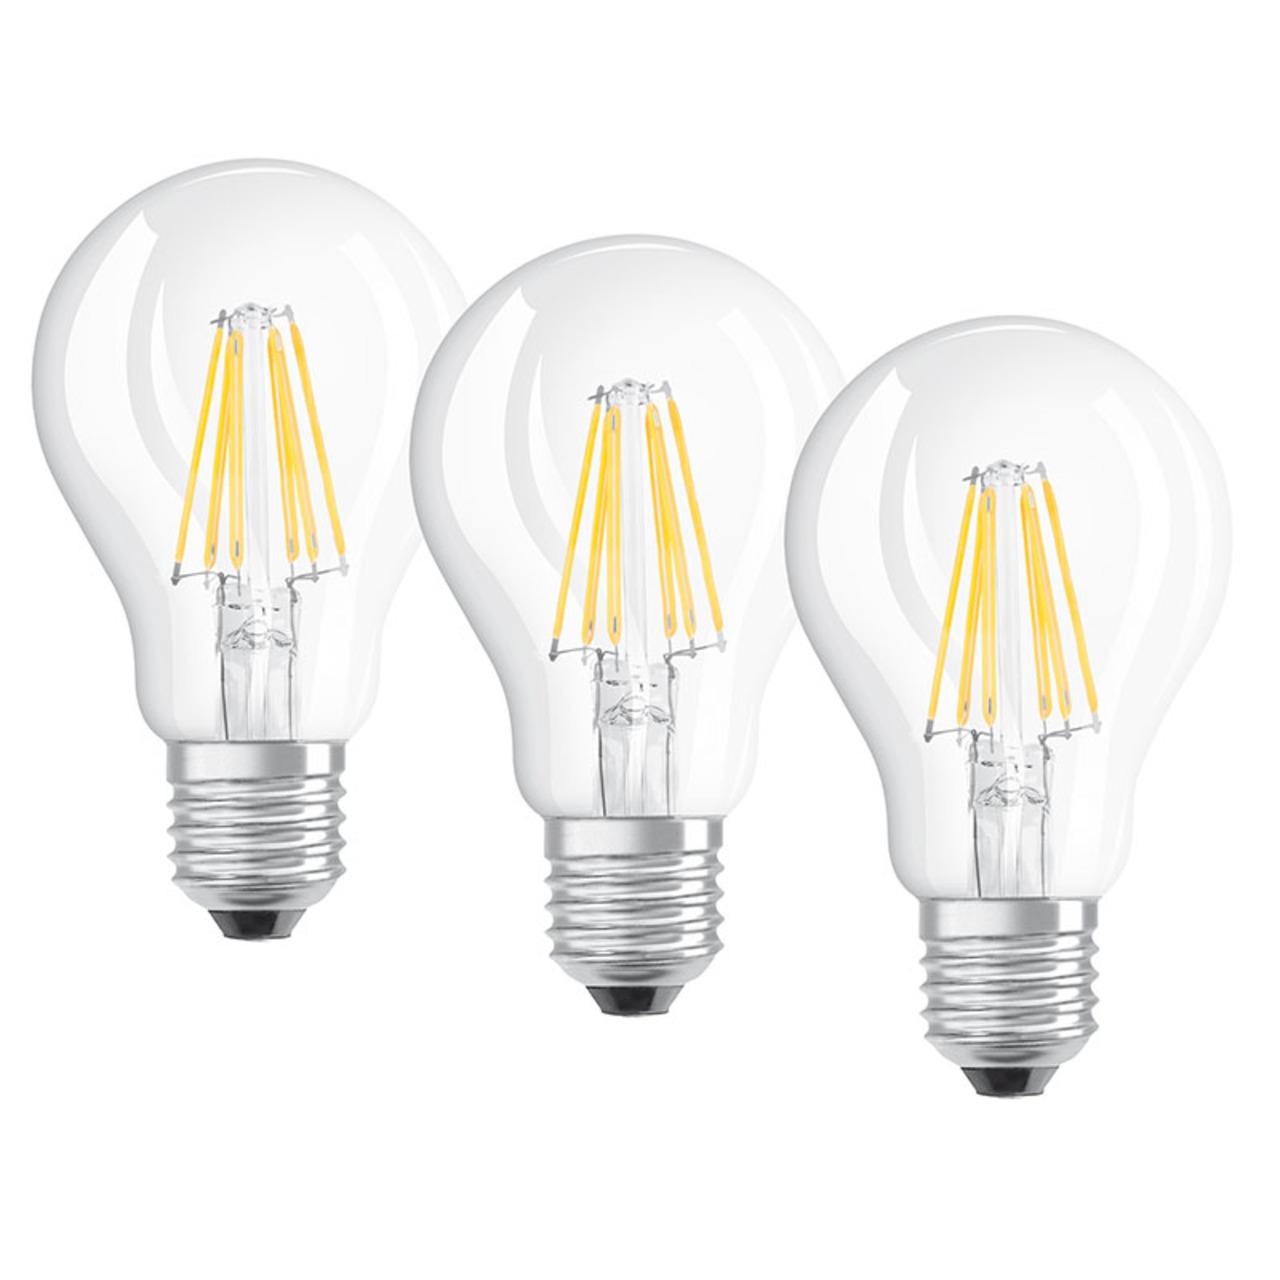 OSRAM 3er Set LED RETRO Glass Bulb 7-5-W-LED-Lampe E27- klar